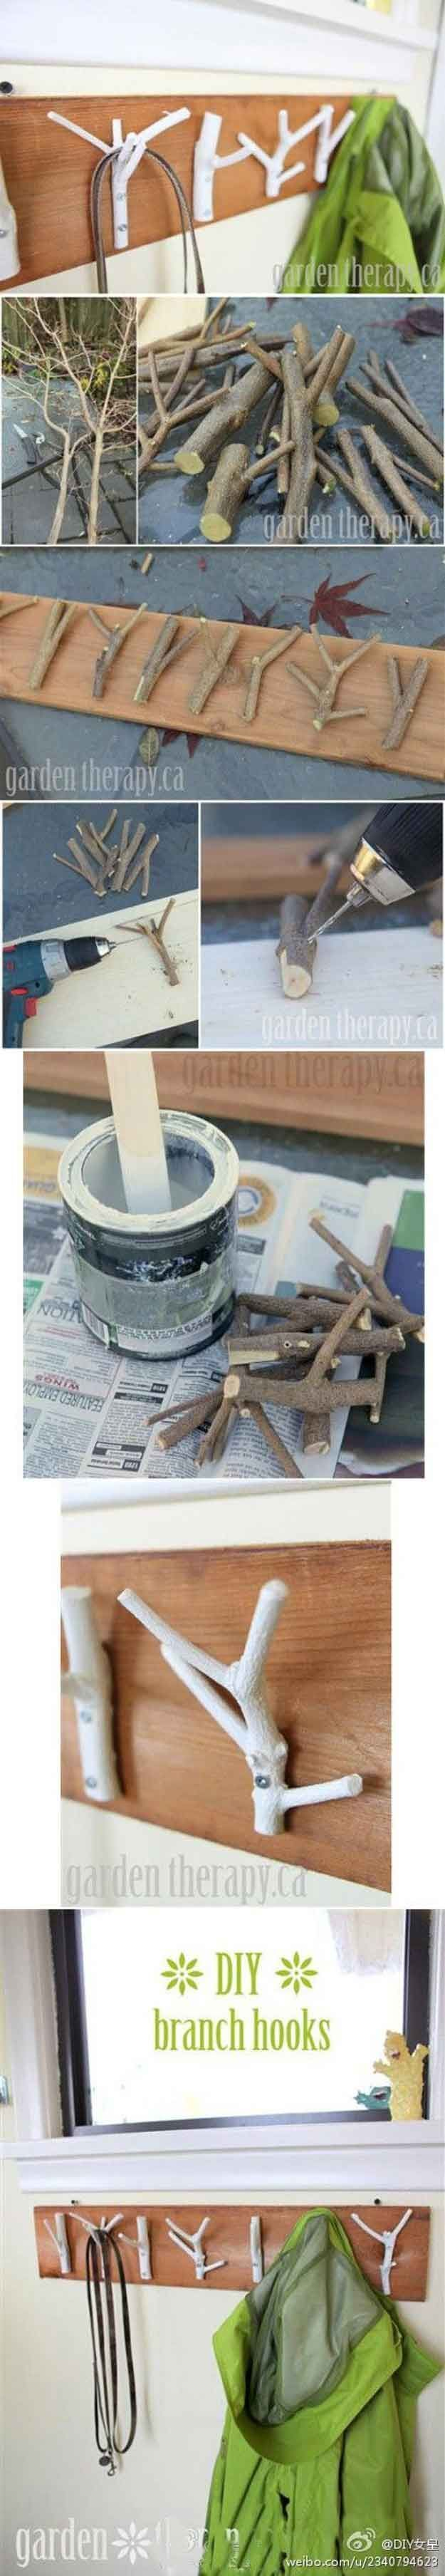 Easy DIY Teen Room Decor Ideas for Boys DIYReady.com | Easy DIY Crafts, Fun Projects, & DIY Craft Ideas For Kids & Adults - http://centophobe.com/easy-diy-teen-room-decor-ideas-for-boys-diyready-com-easy-diy-crafts-fun-projects-diy-craft-ideas-for-kids-adults-2/ -